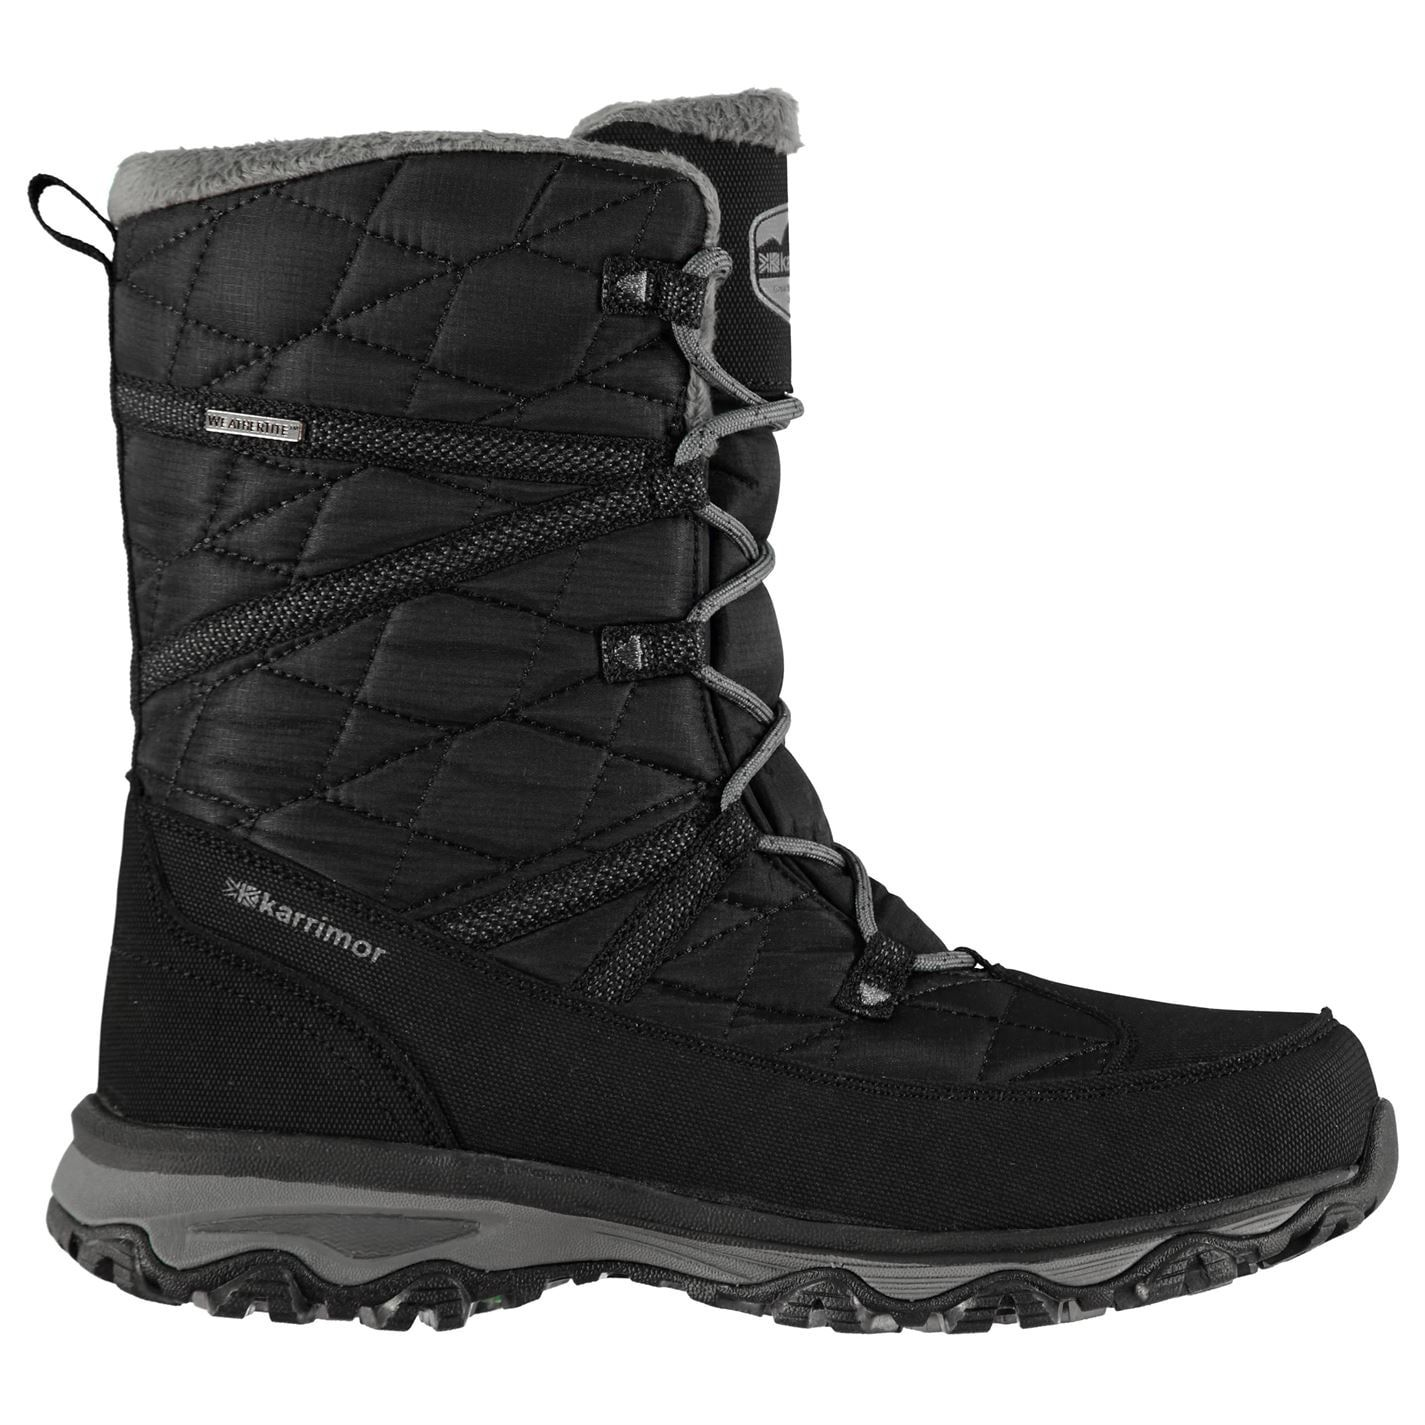 3851031868c Karrimor St Moritz Snow Boots Ladies (27602903_3) - Woomie.gr